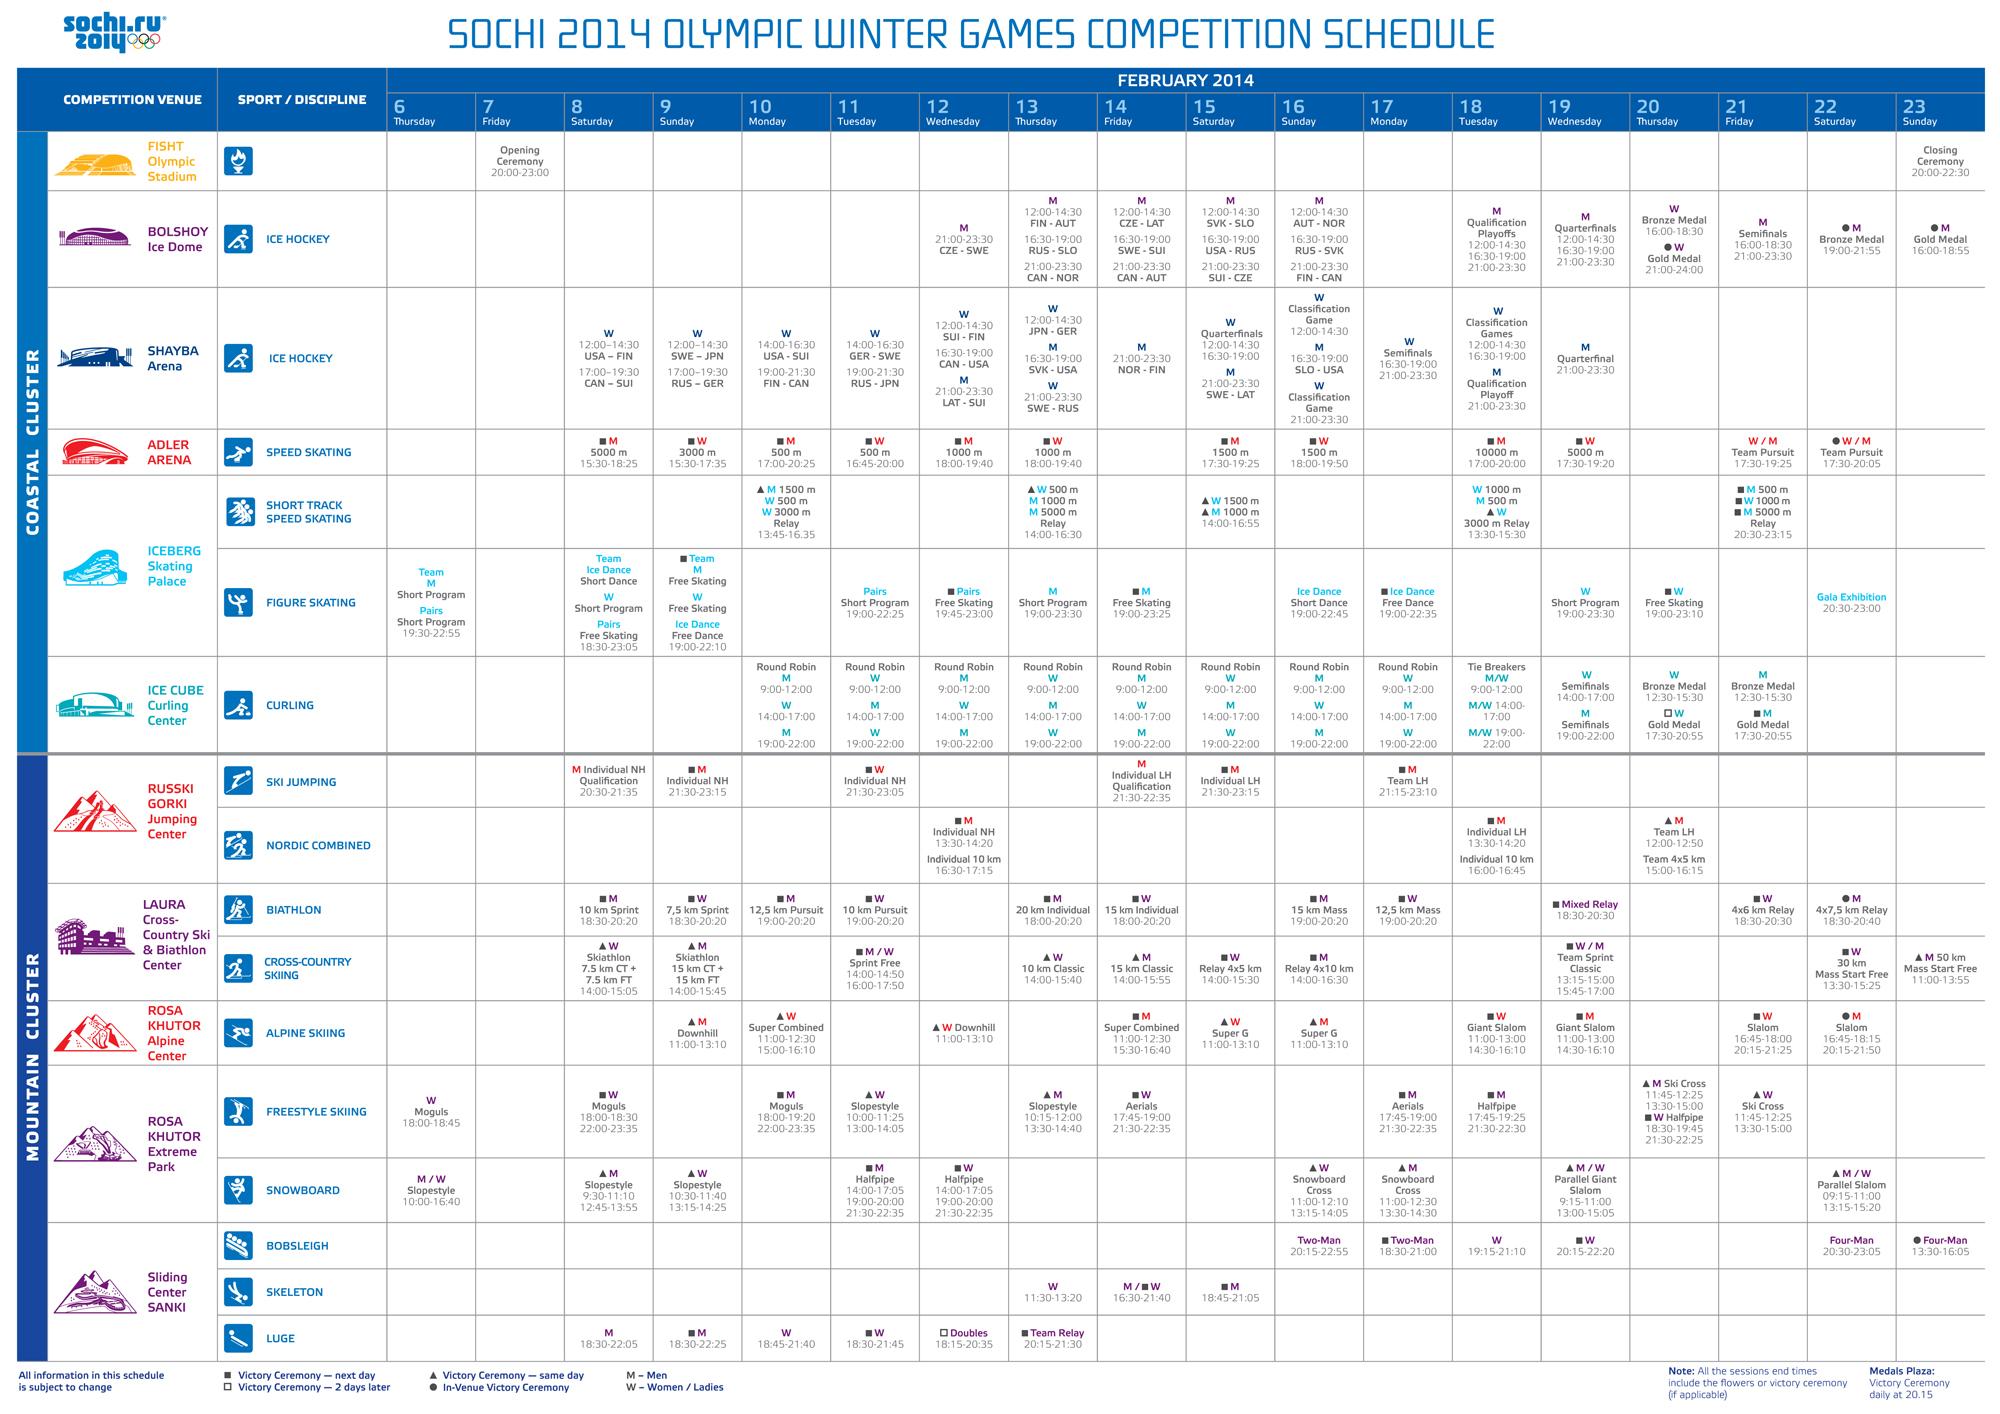 Sochi Competition Schedule